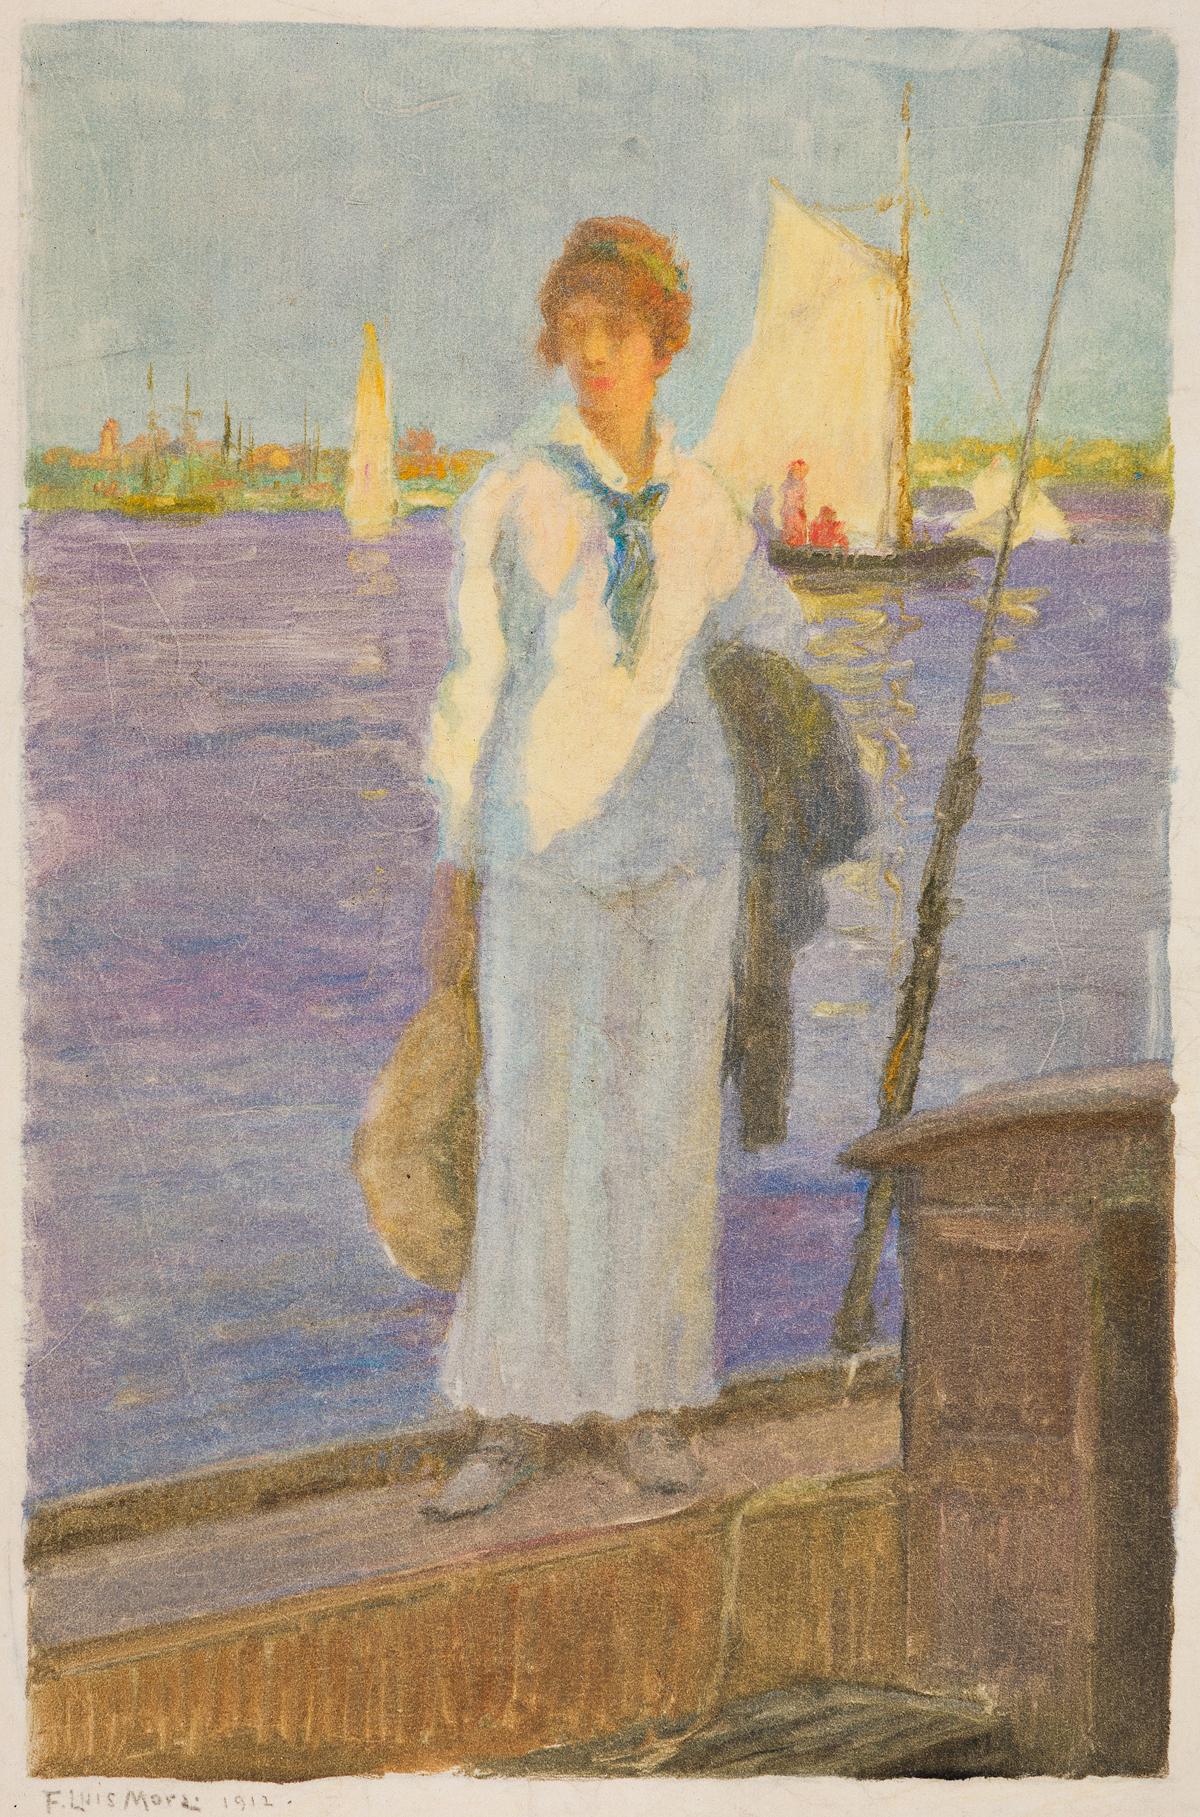 FRANCIS LUIS MORA Woman on a Sailboat at the Waters Edge.